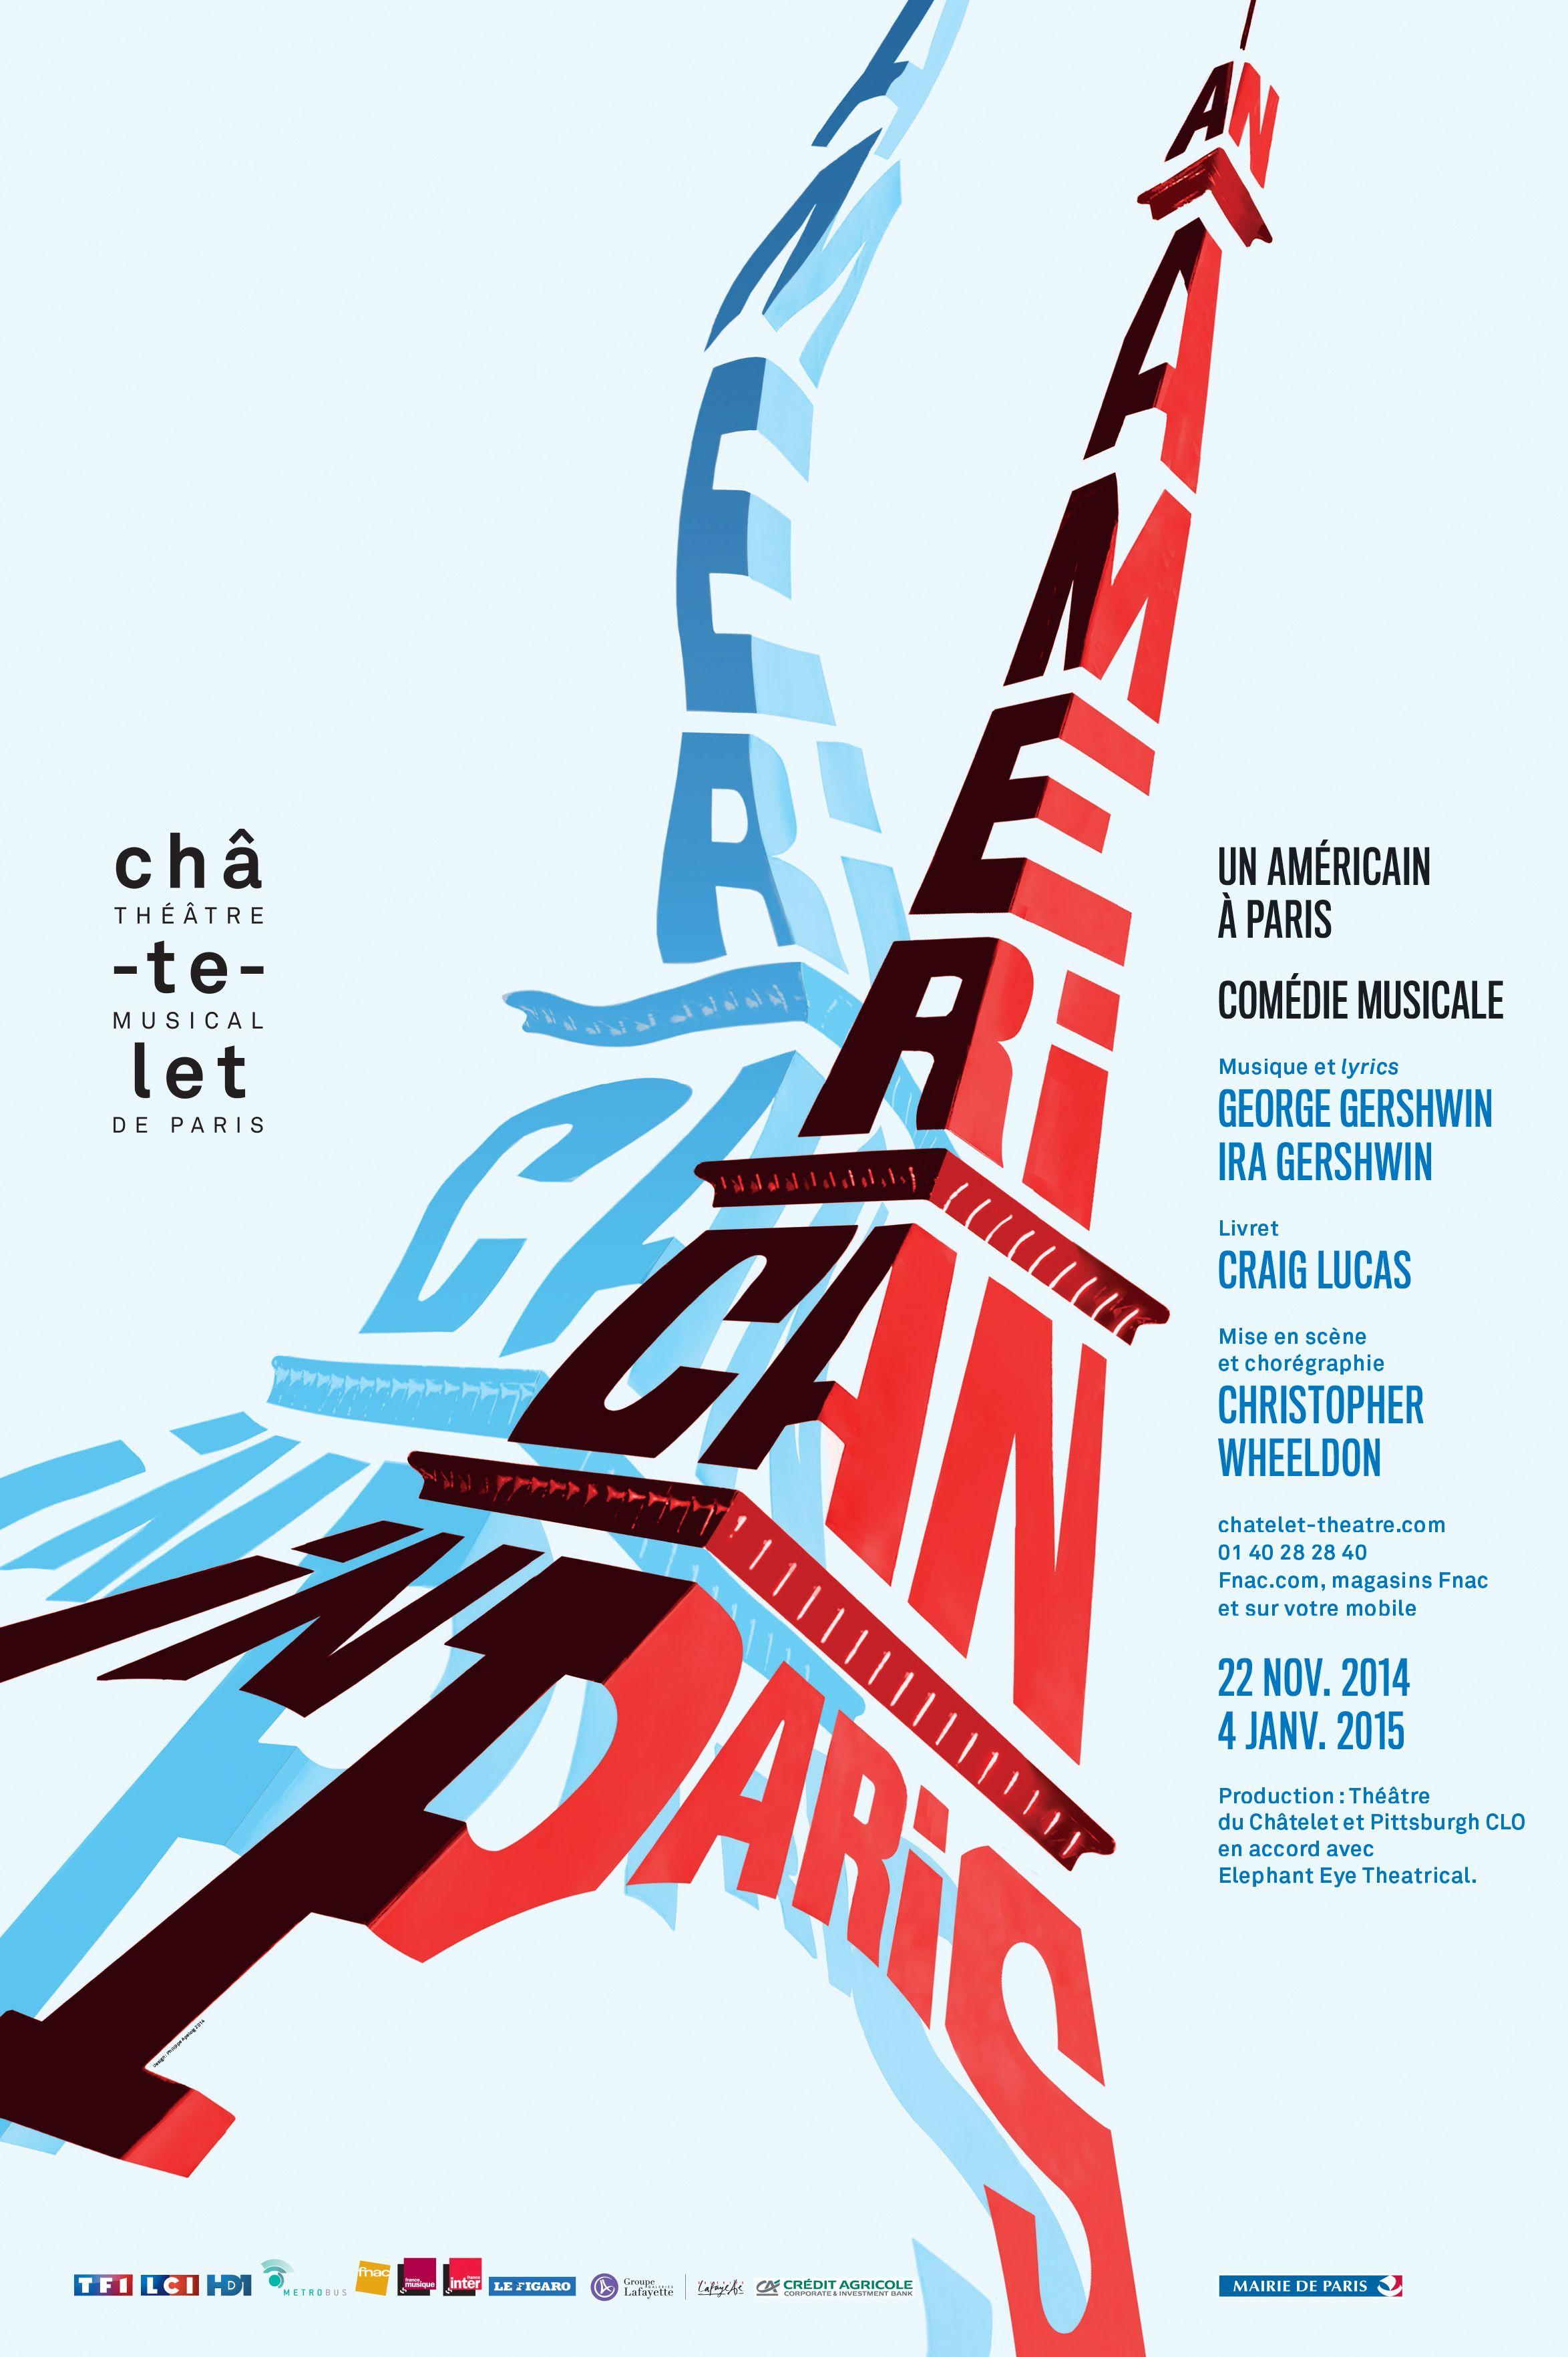 An American In Paris Un Americain A Paris Theatre Du Chatelet Comediemusicale Anamericaninpa Typographic Poster Design Graphic Poster Graphic Design Posters